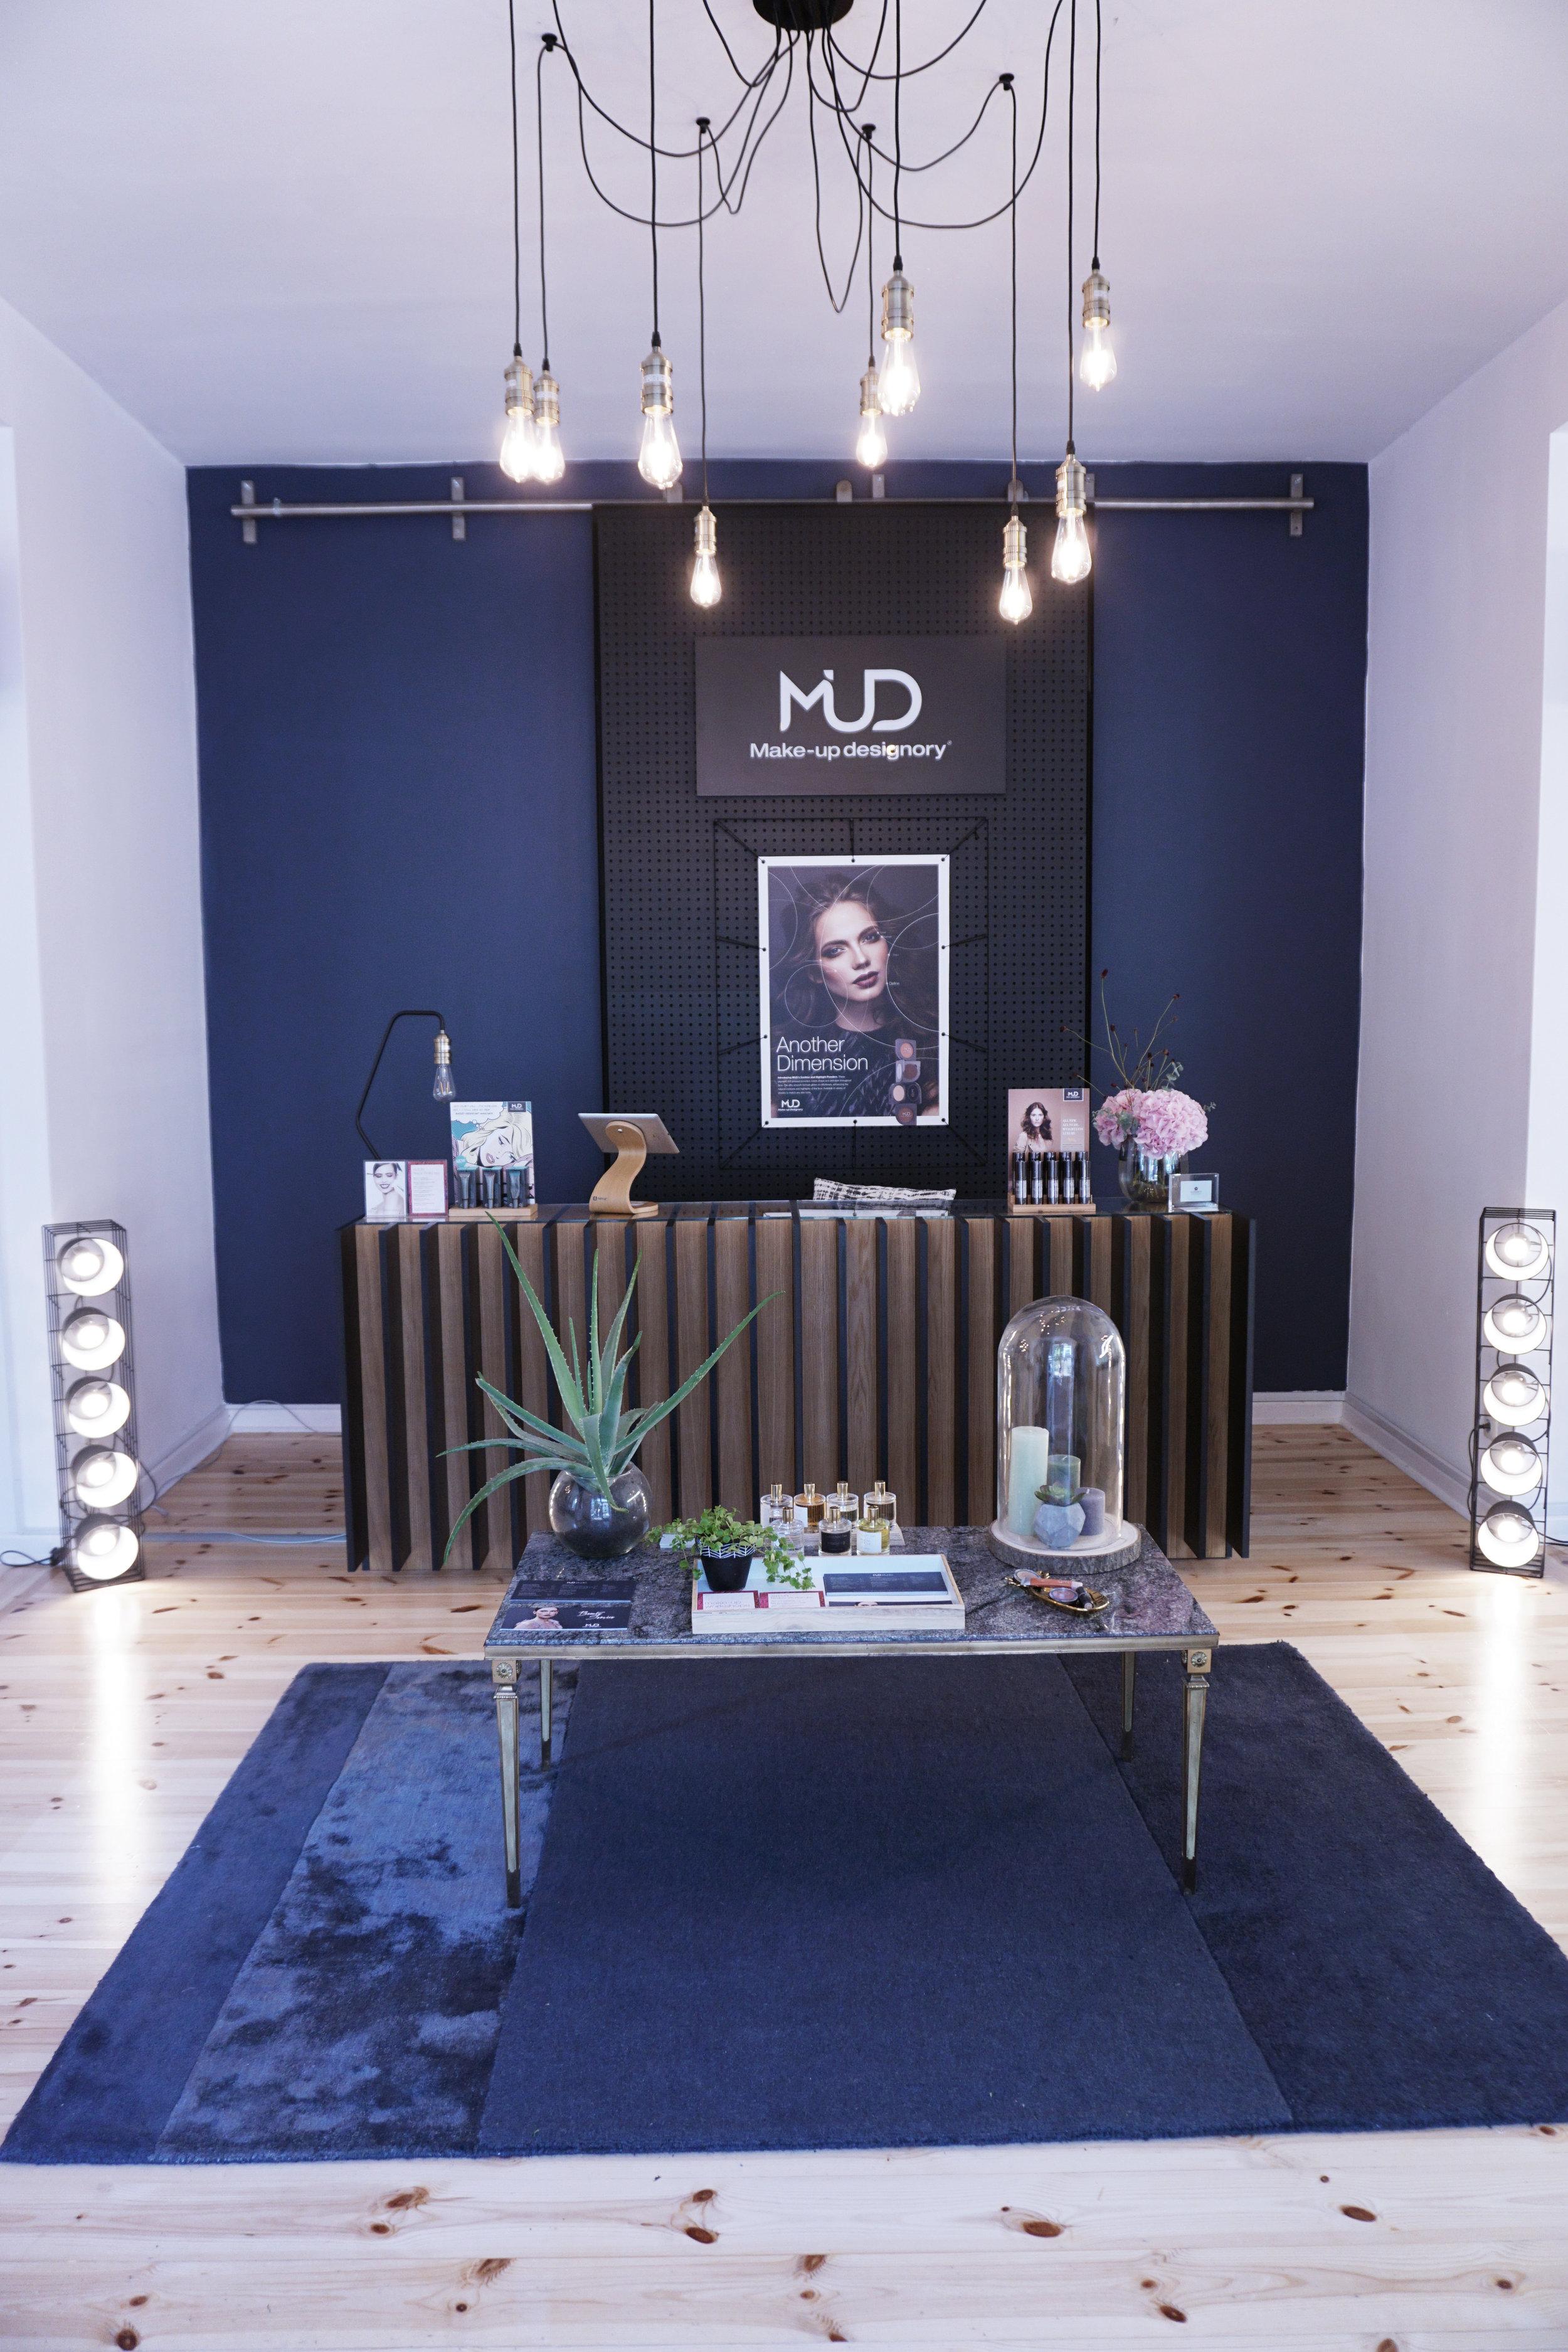 Makeup_Designory_Shop_Beautysalon_Berlin